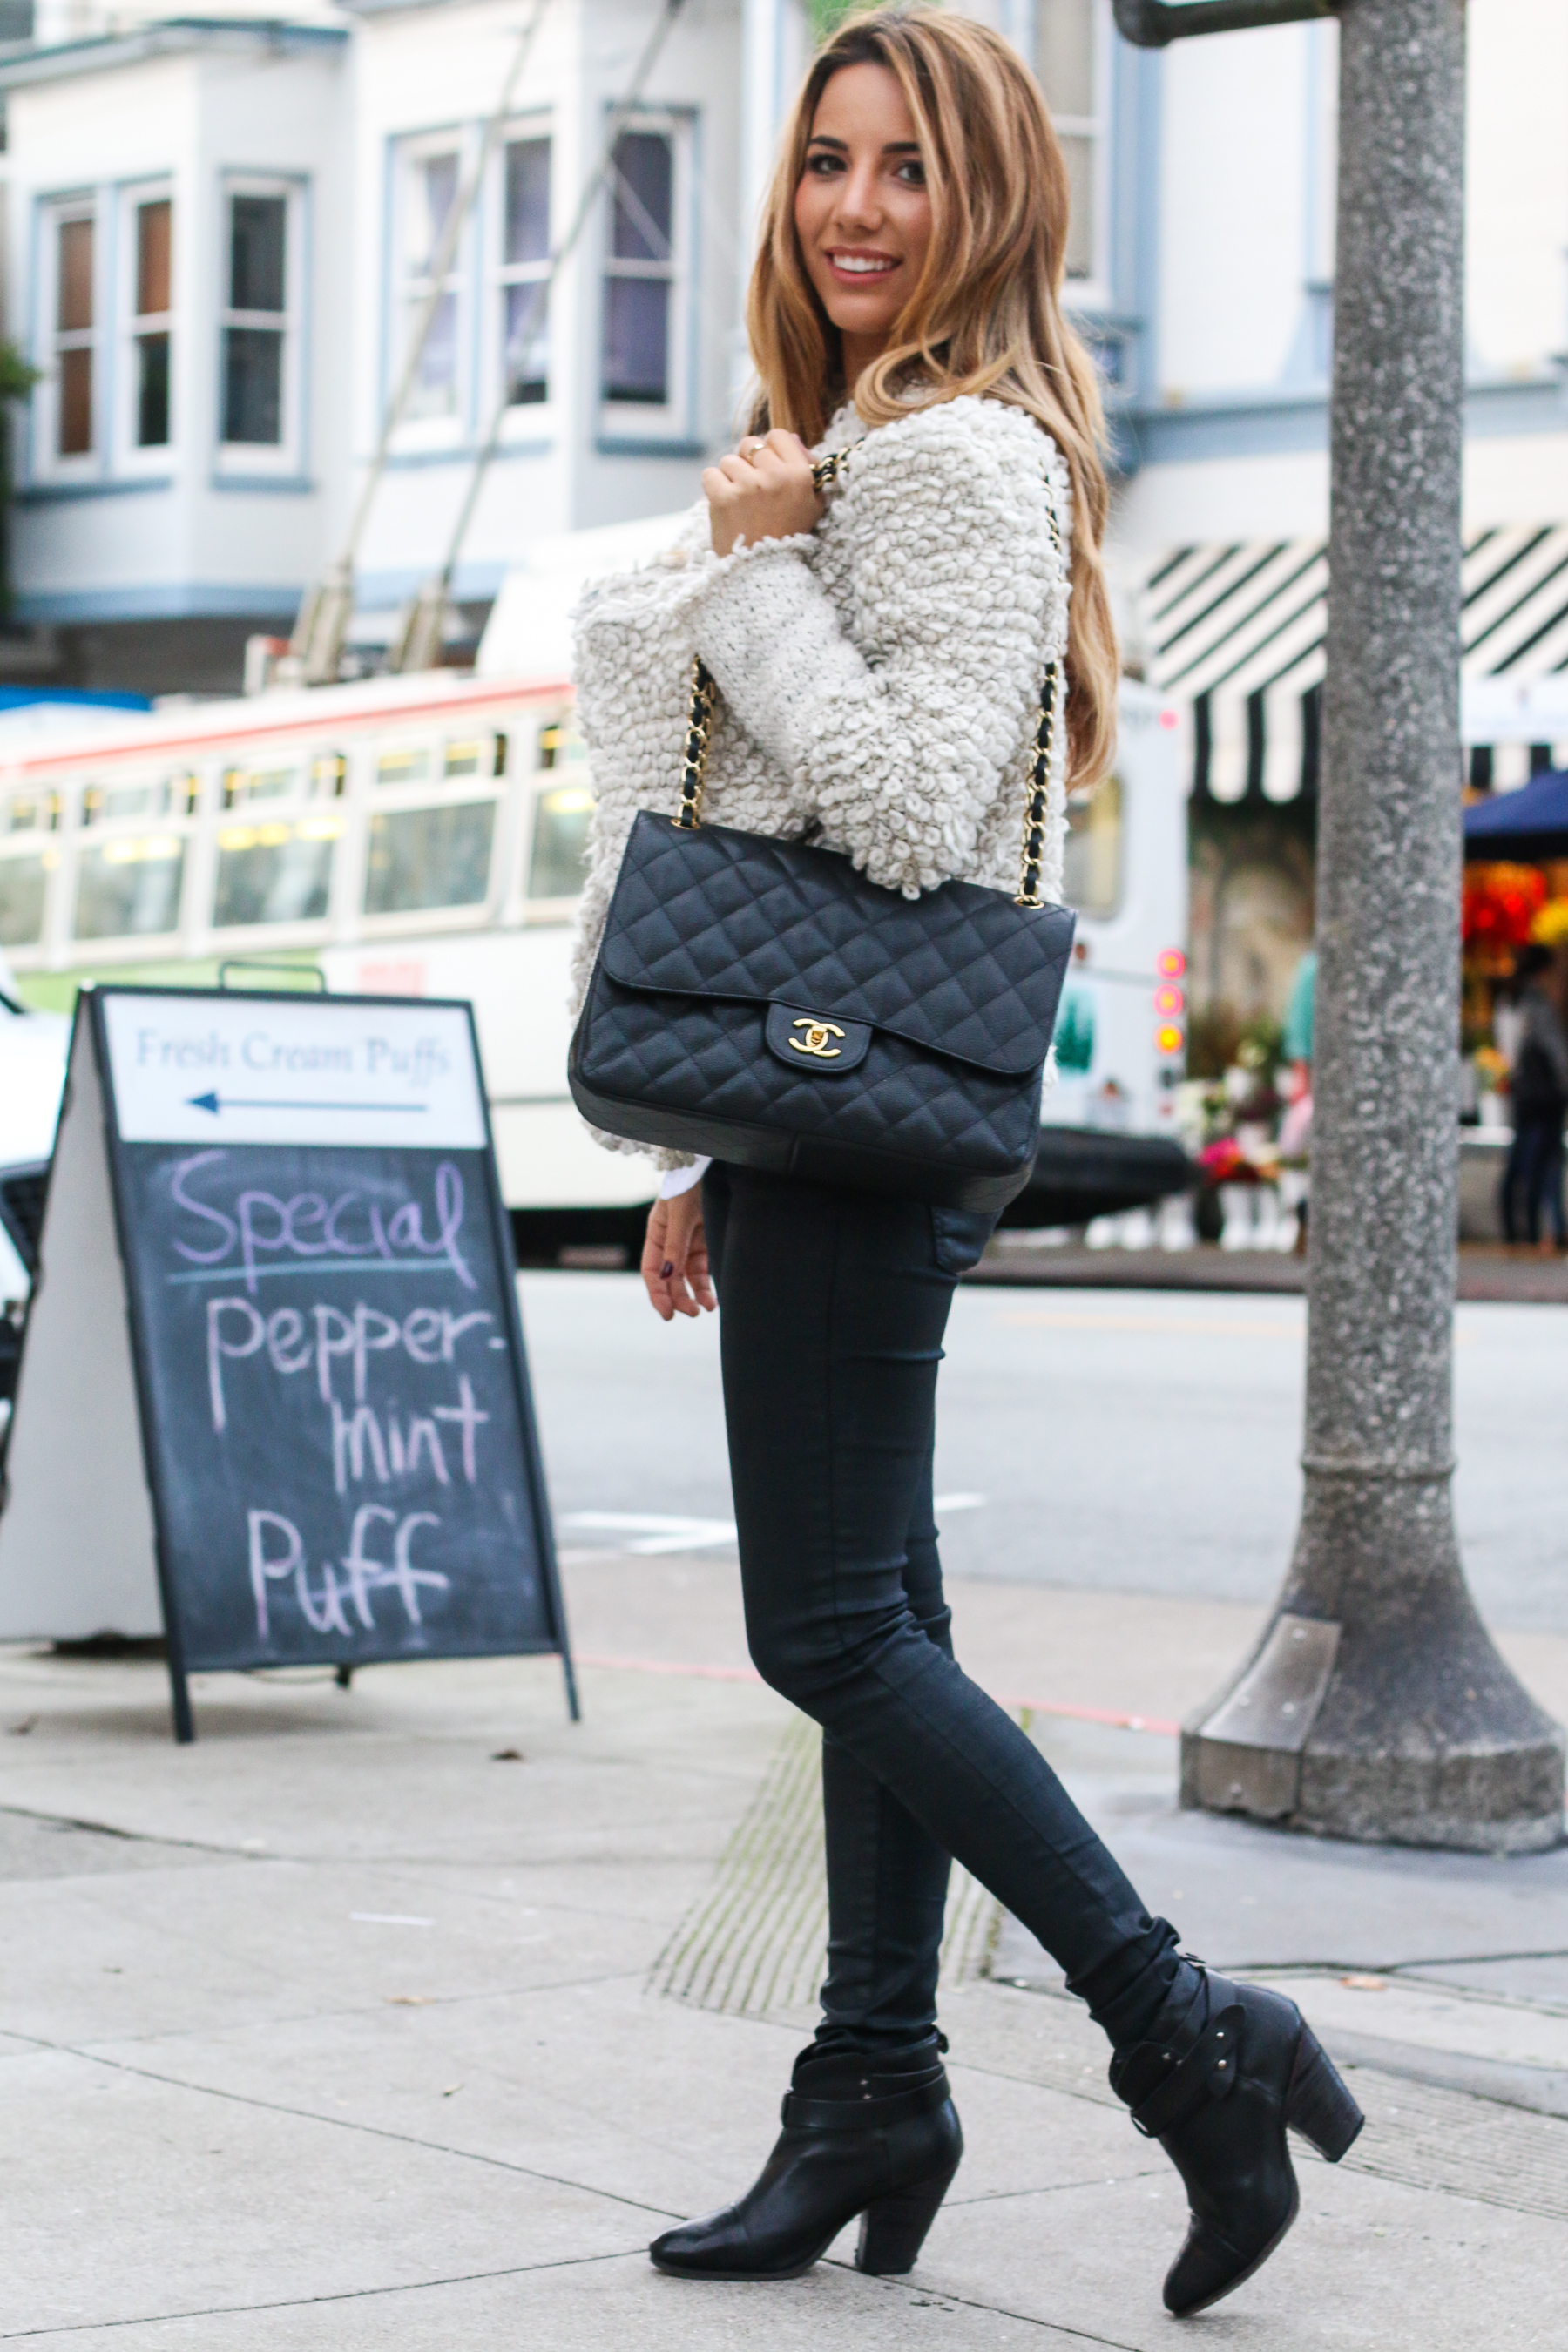 Ariana-Lauren-Fashion-Born-Blogger-Streetstyle-Photography-by-Ryan-Chua-2305